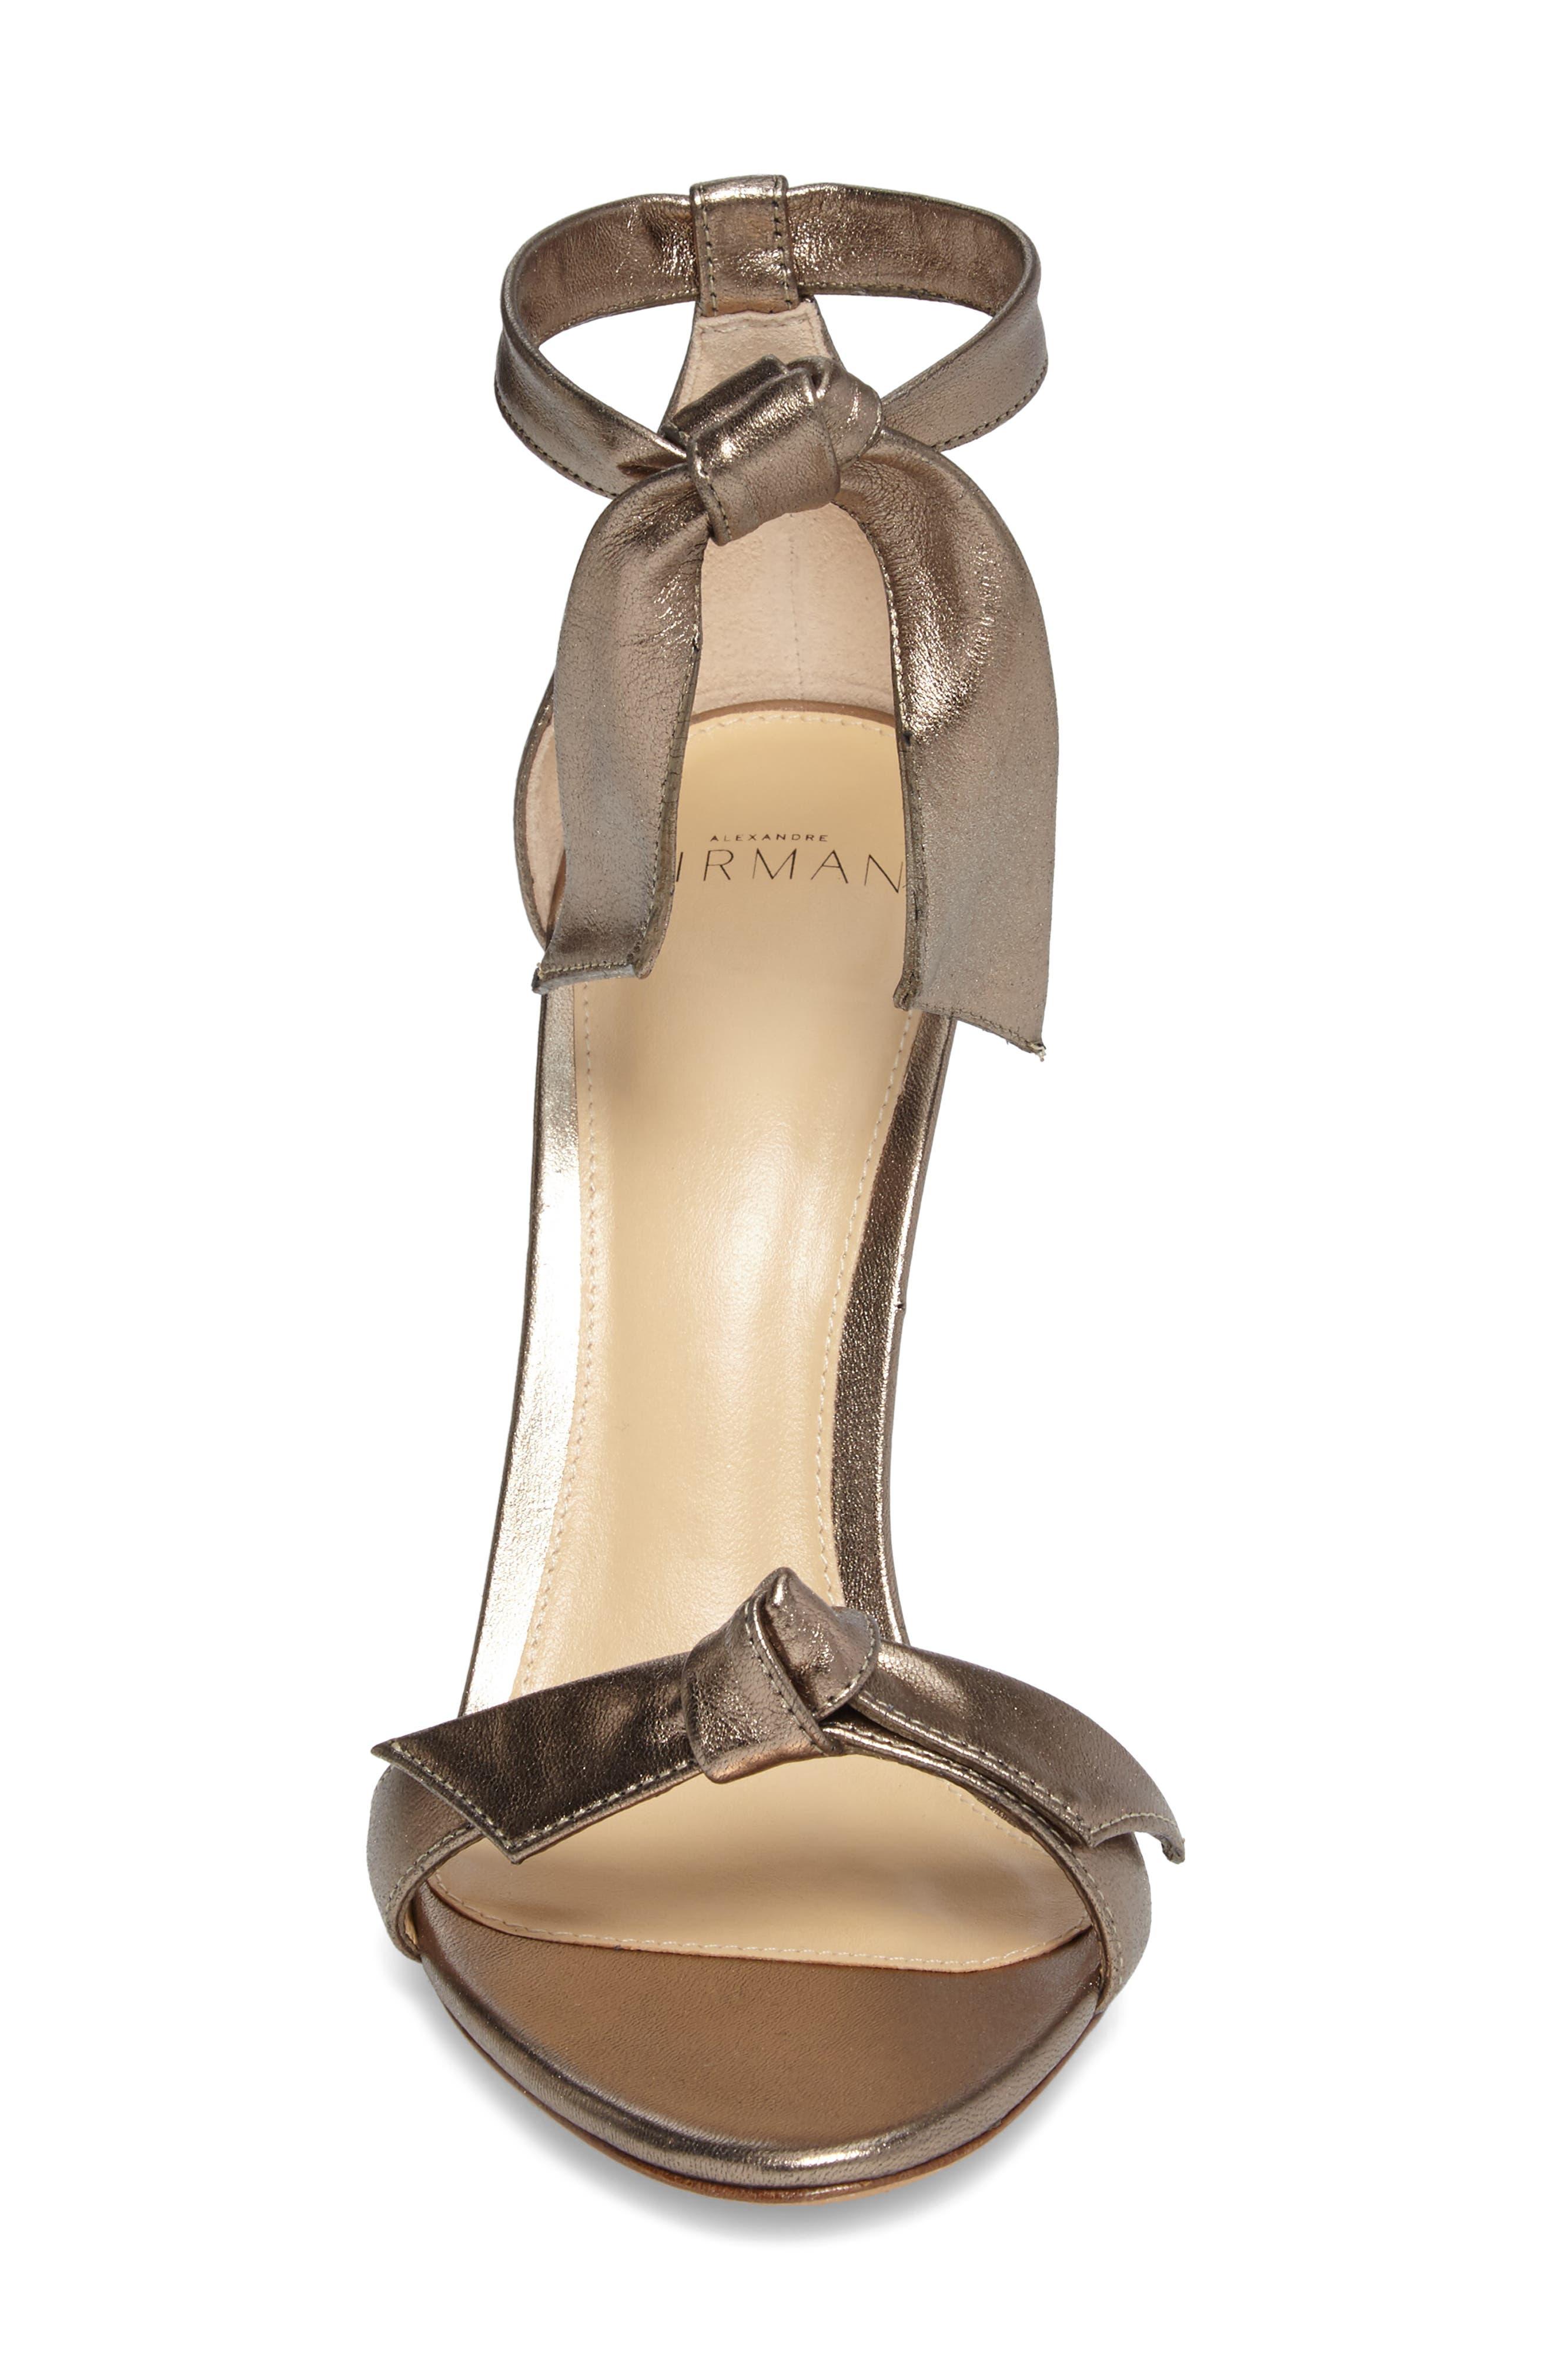 Clarita Ankle Tie Sandal,                             Alternate thumbnail 4, color,                             METALLIC GOLD LEATHER